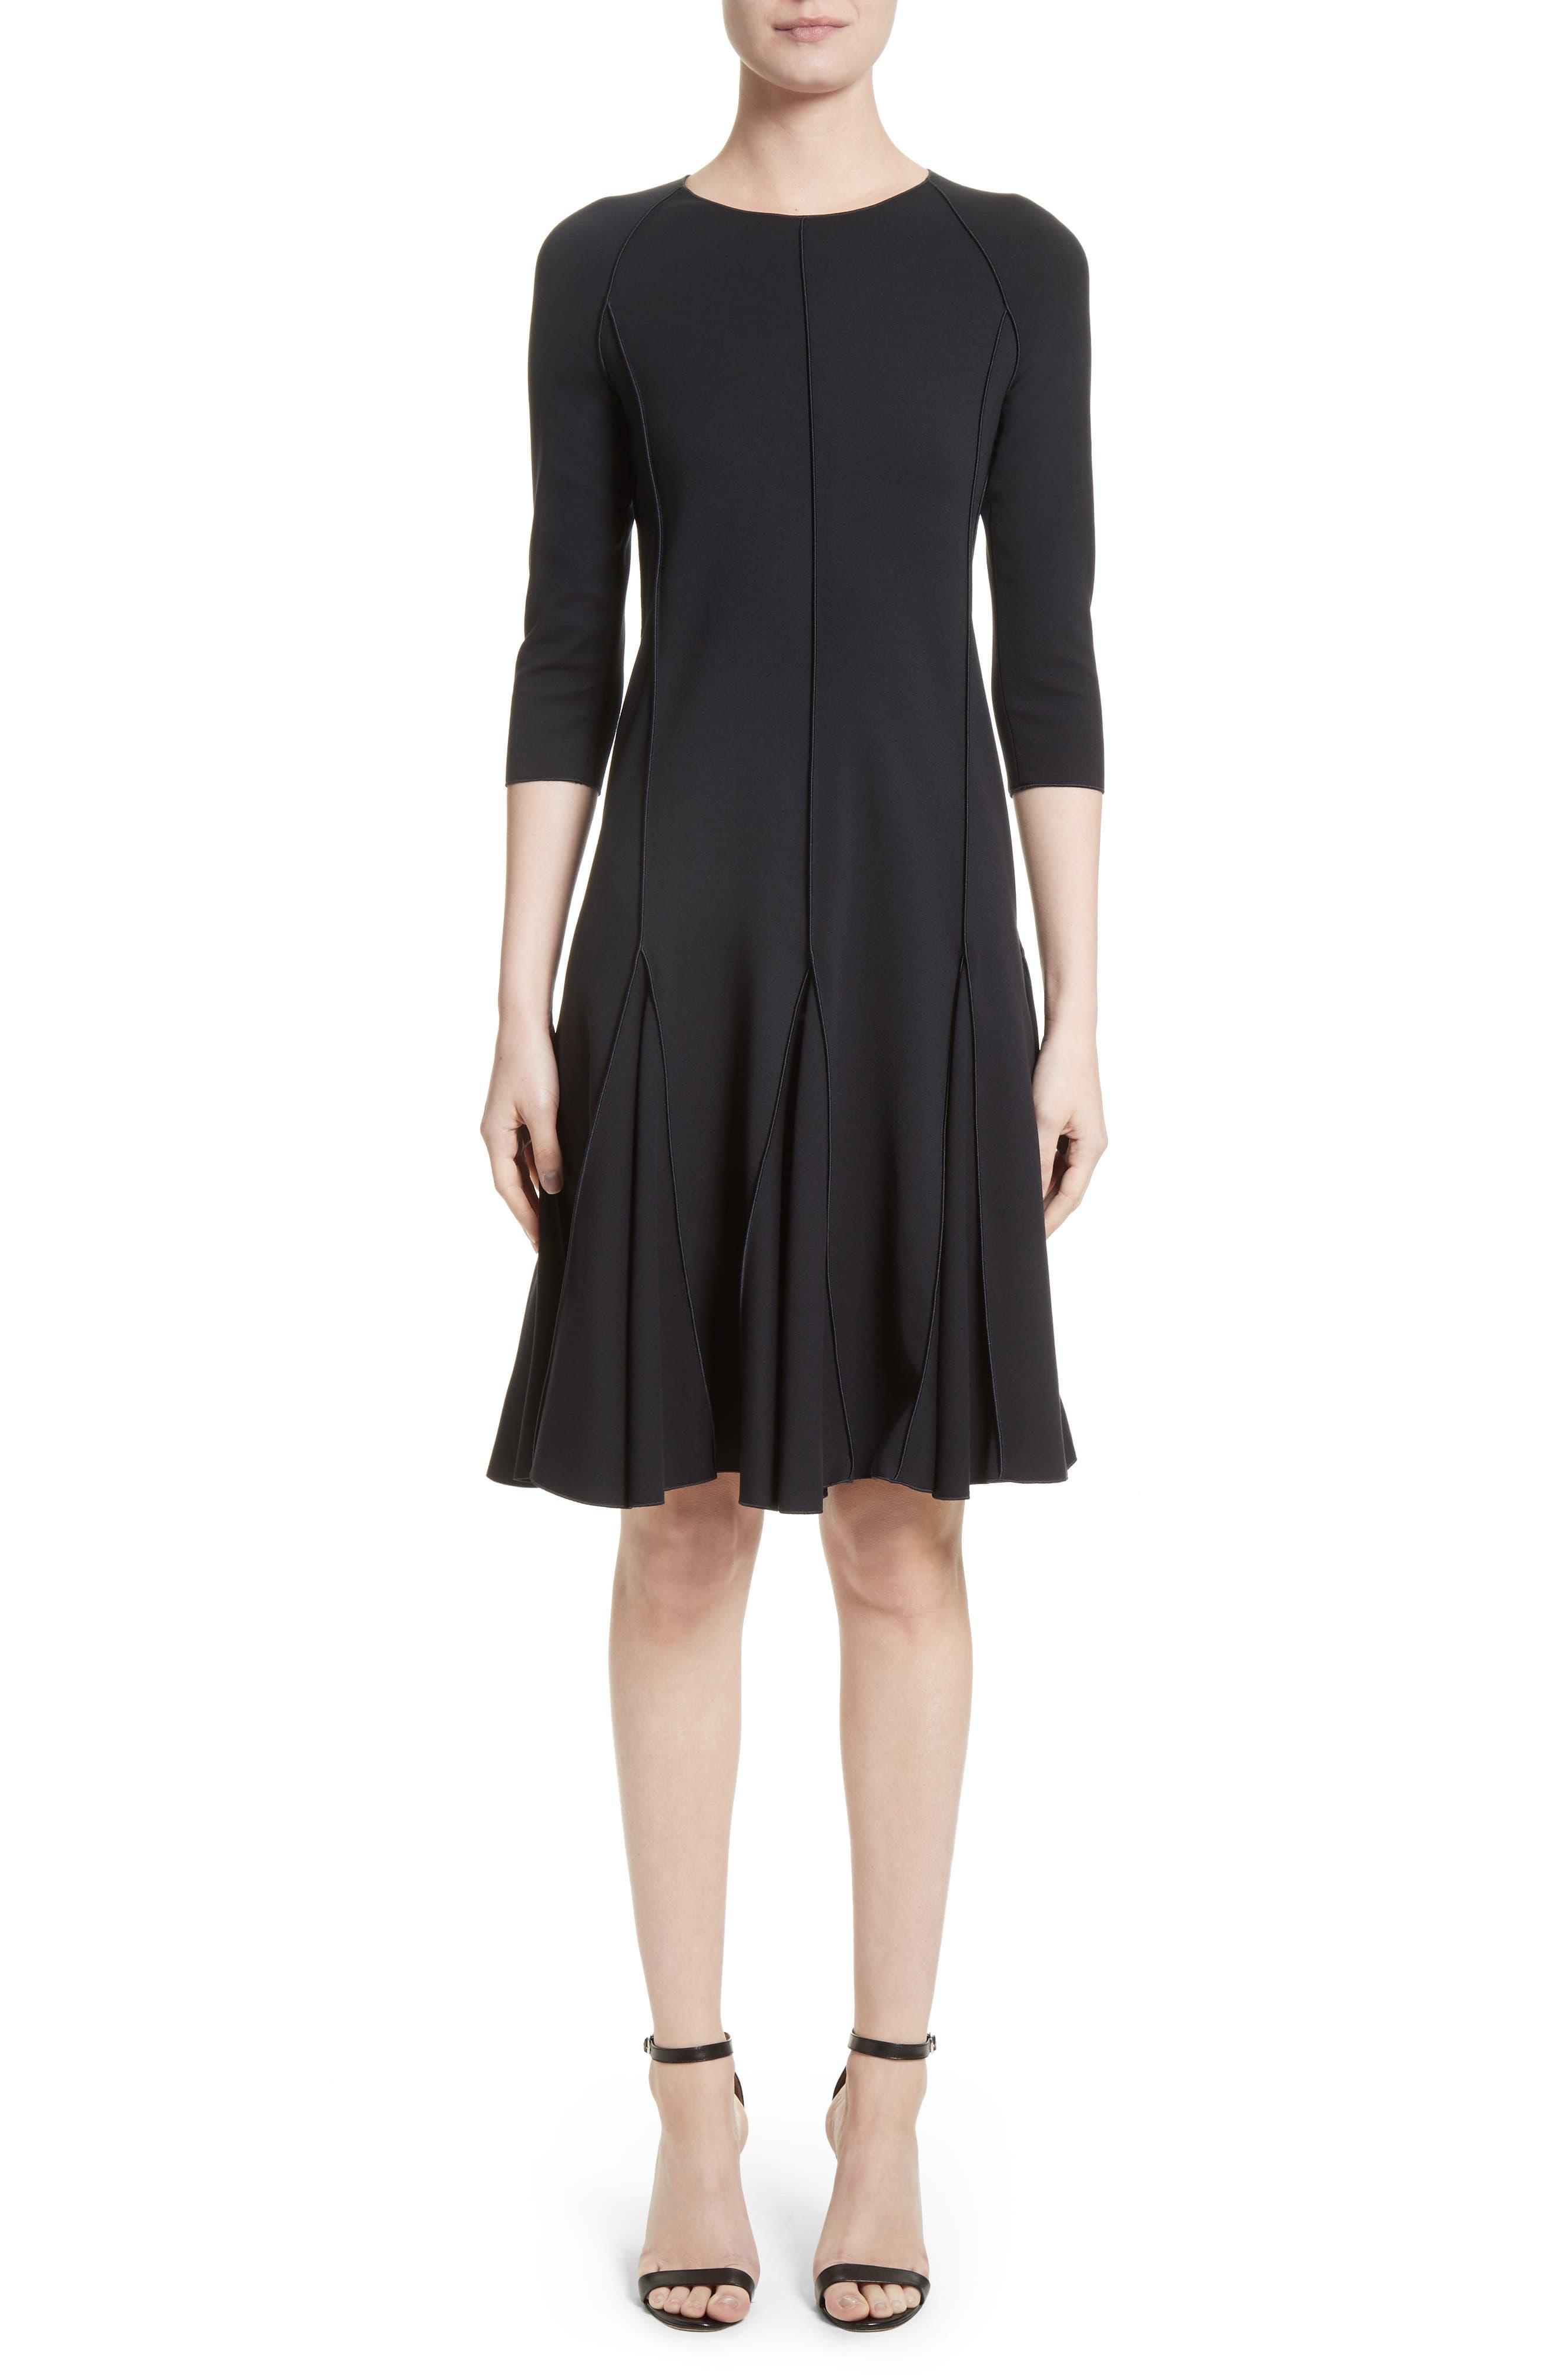 Main Image - Armani Collezioni Seamed Jersey Fit & Flare Dress